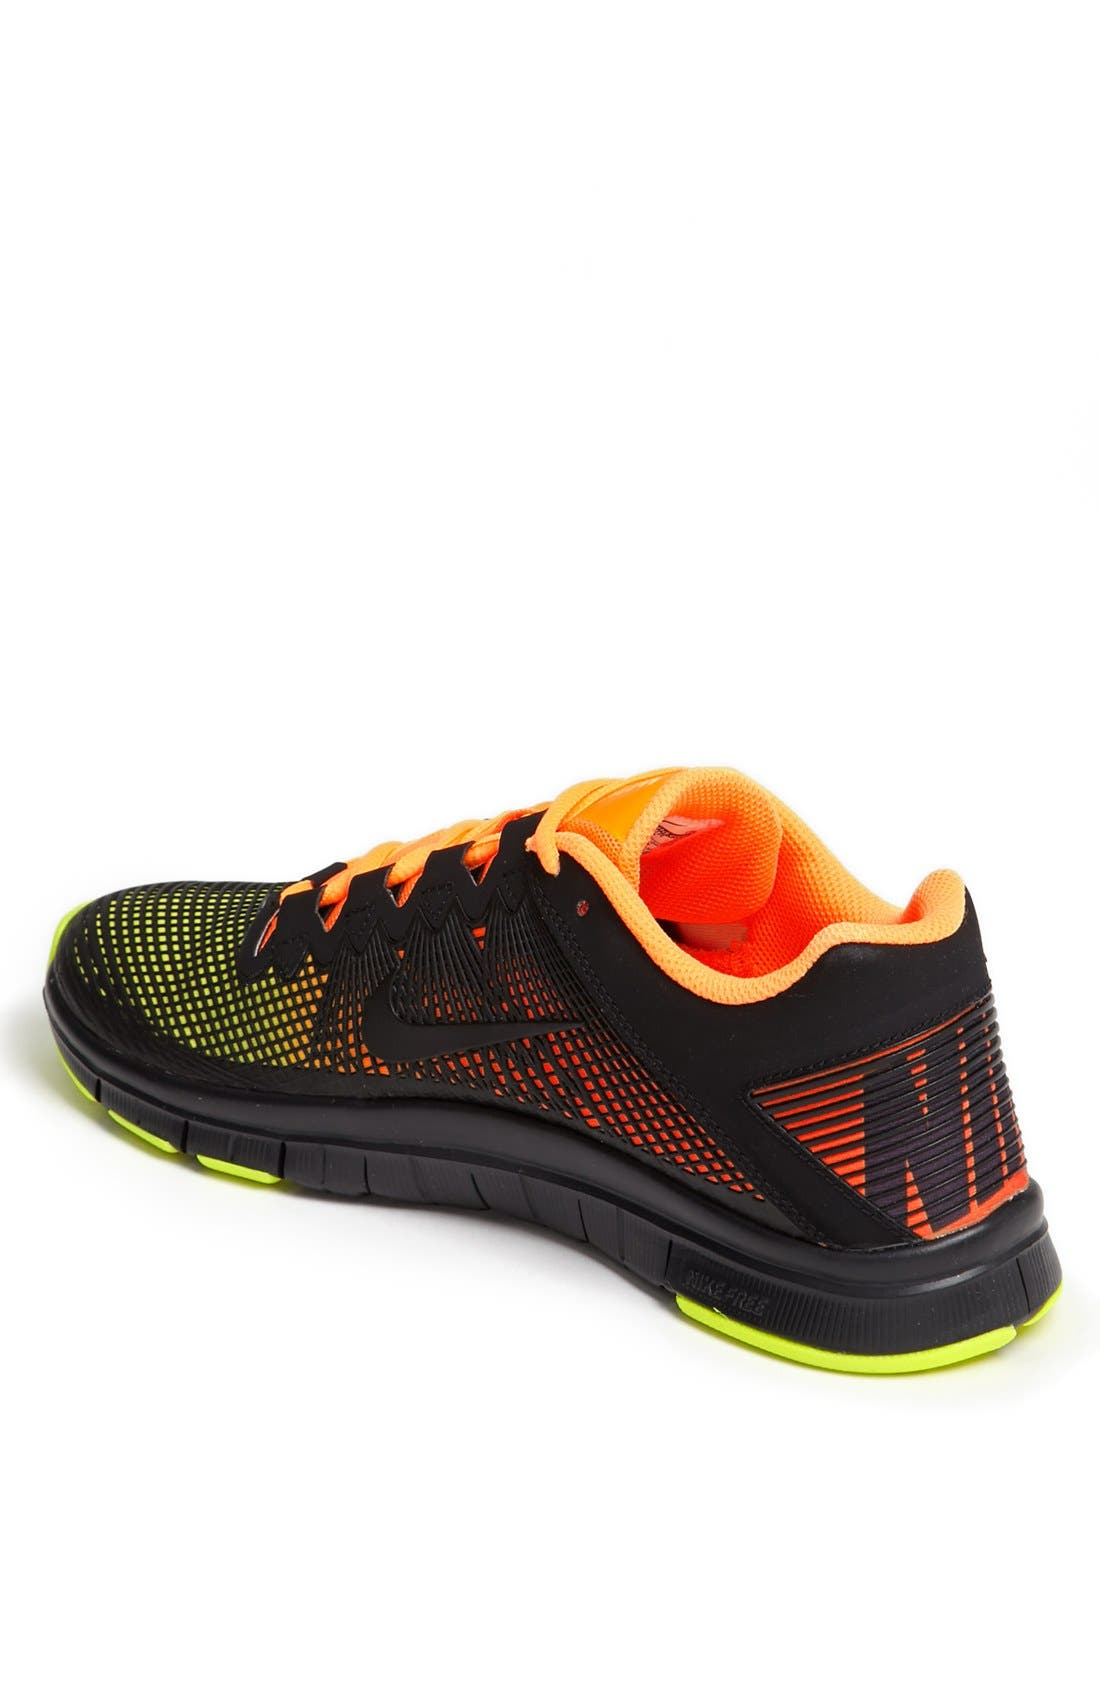 Alternate Image 2  - Nike 'Free Trainer 3.0 NRG' Training Shoe (Men)